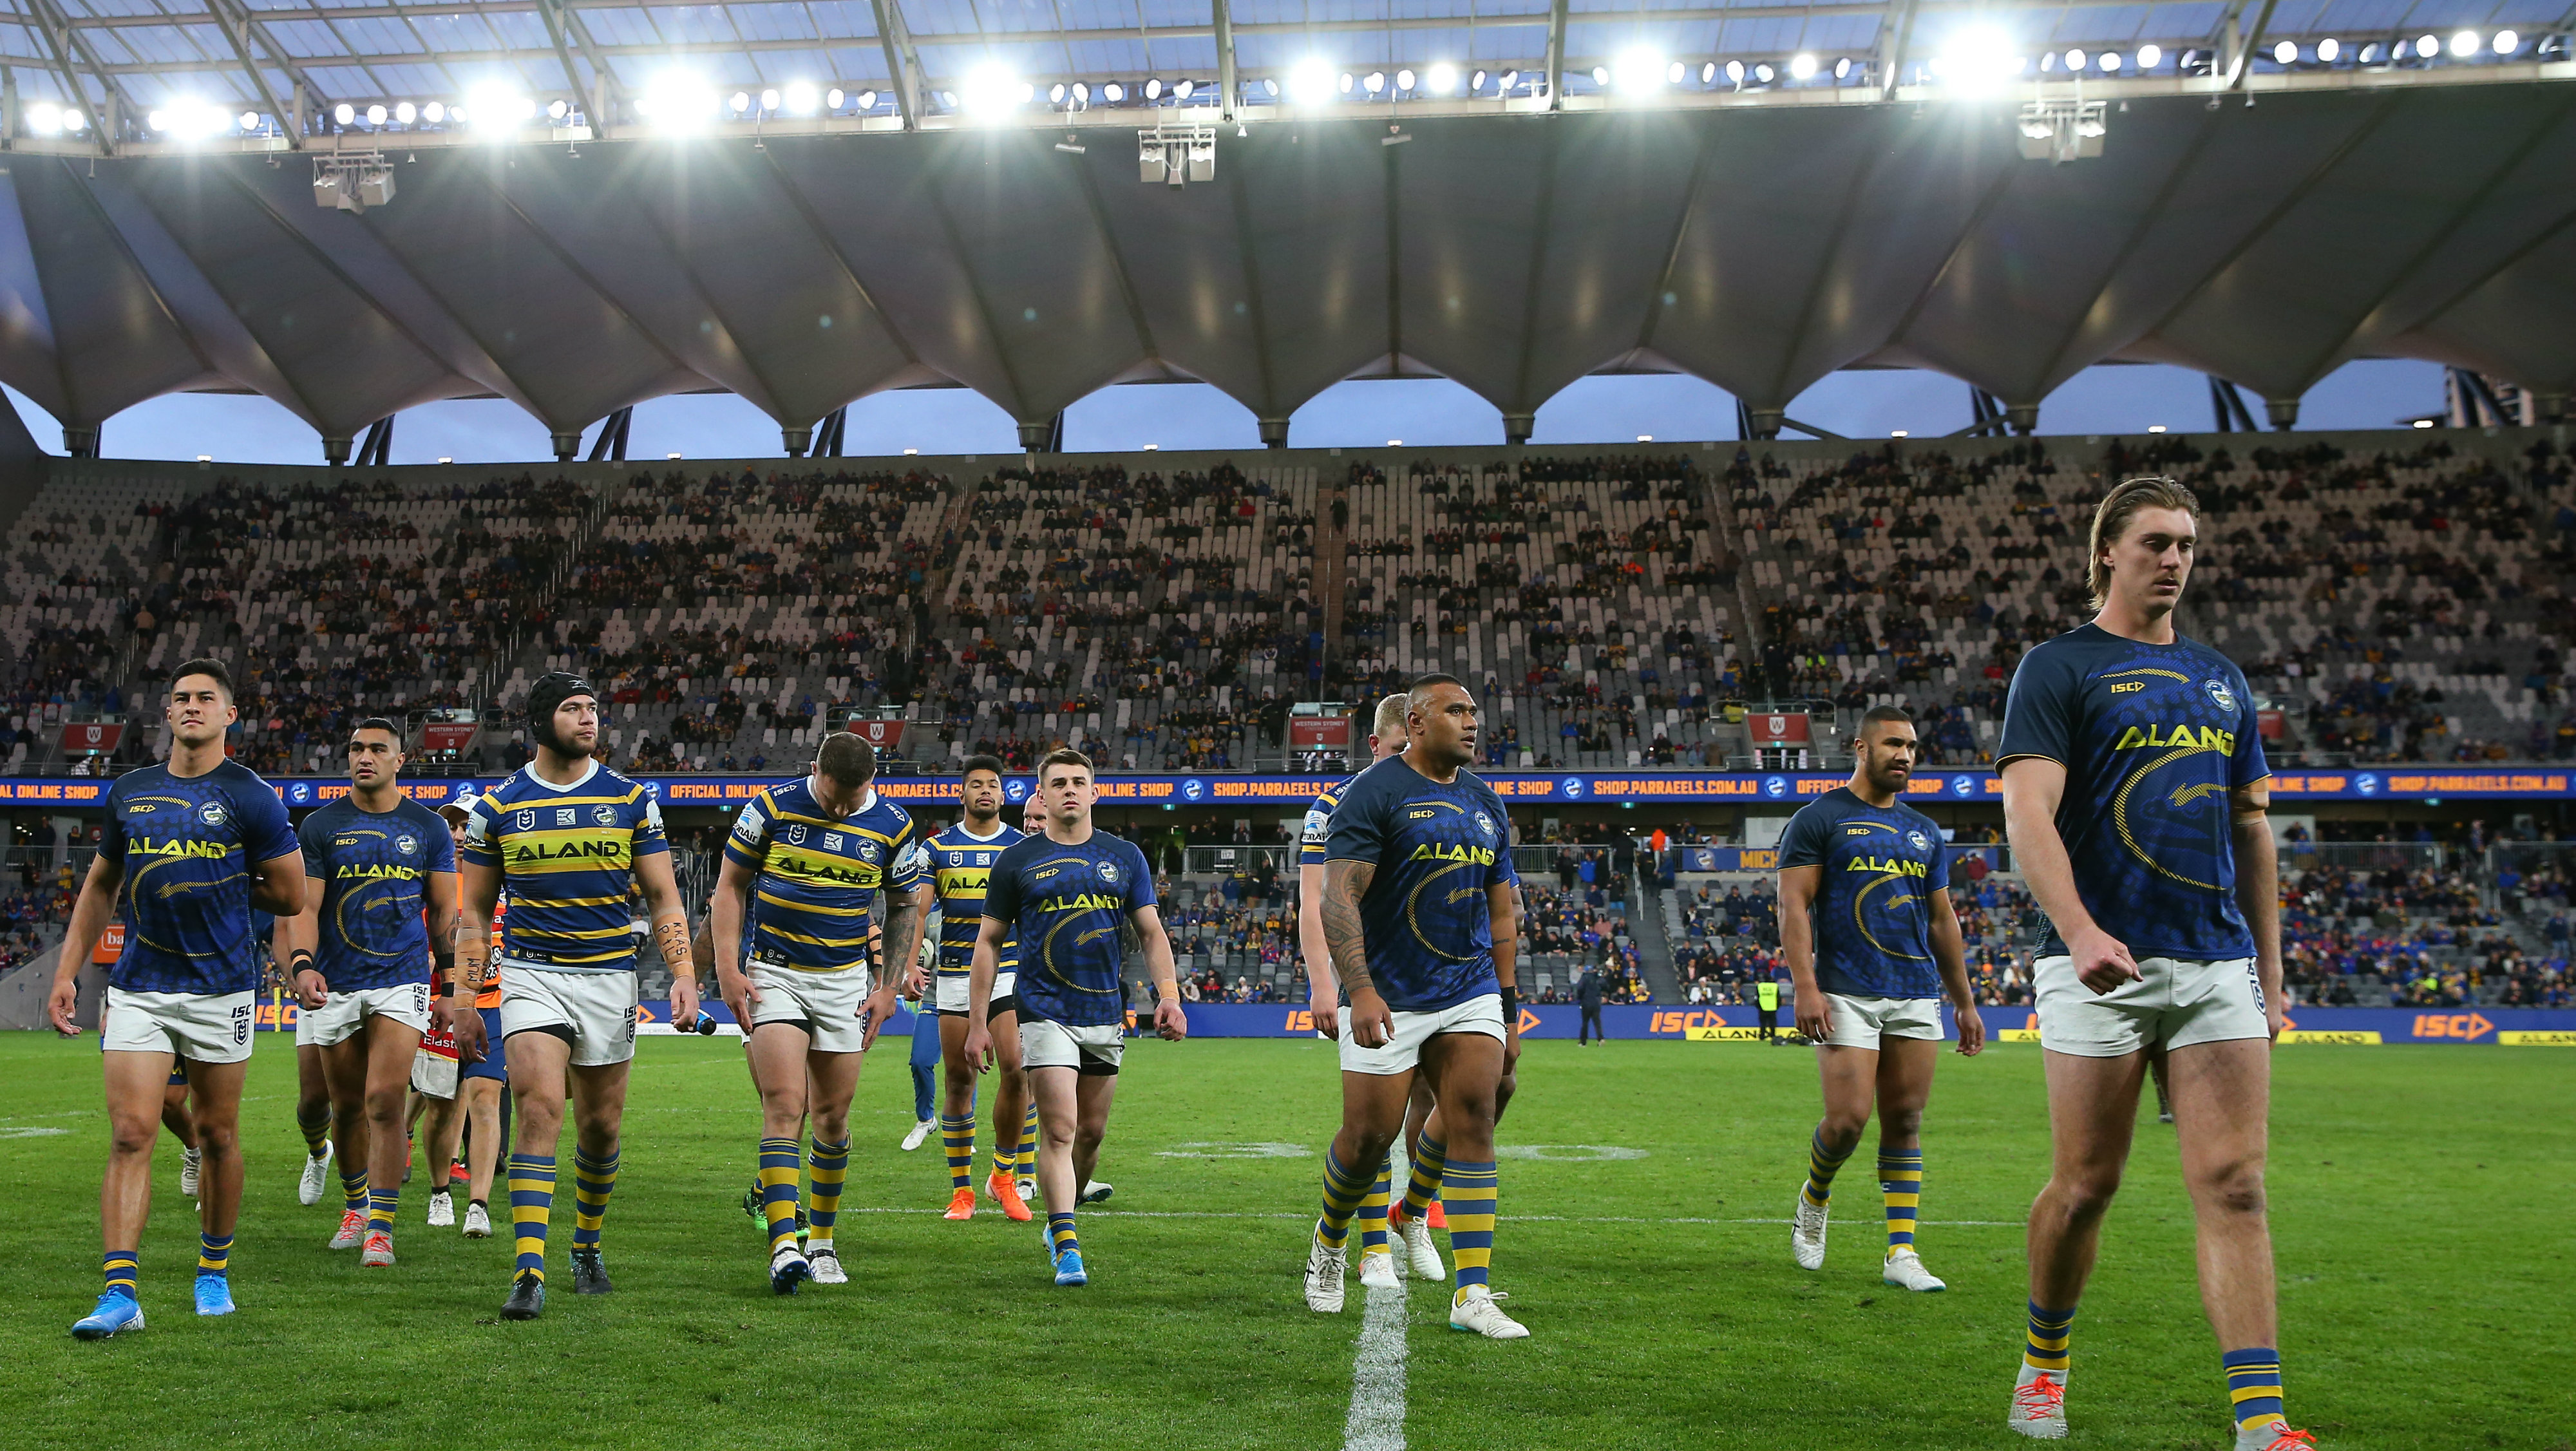 Parramatta Eels preparing to 'splash the cash' on key forward for 2021 NRL season